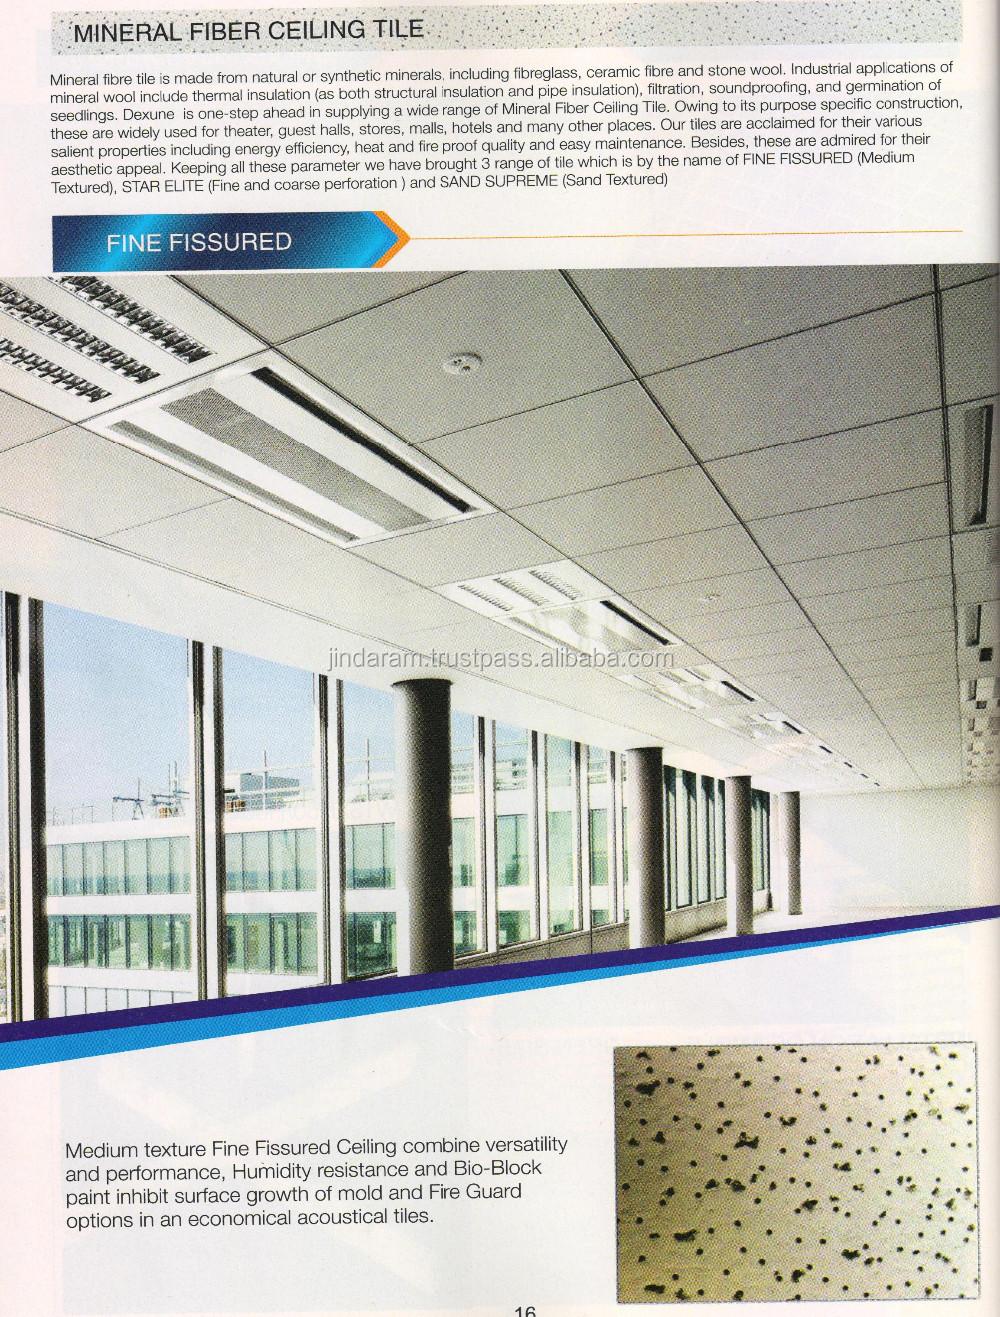 Mineral Fibre Fine Fissured Ceiling Tile Buy Mineral Fibre Fine Fissured Ceiling Tile Mineral Fibre Ceiling Mineral Fibre Ceiling Tile Product On